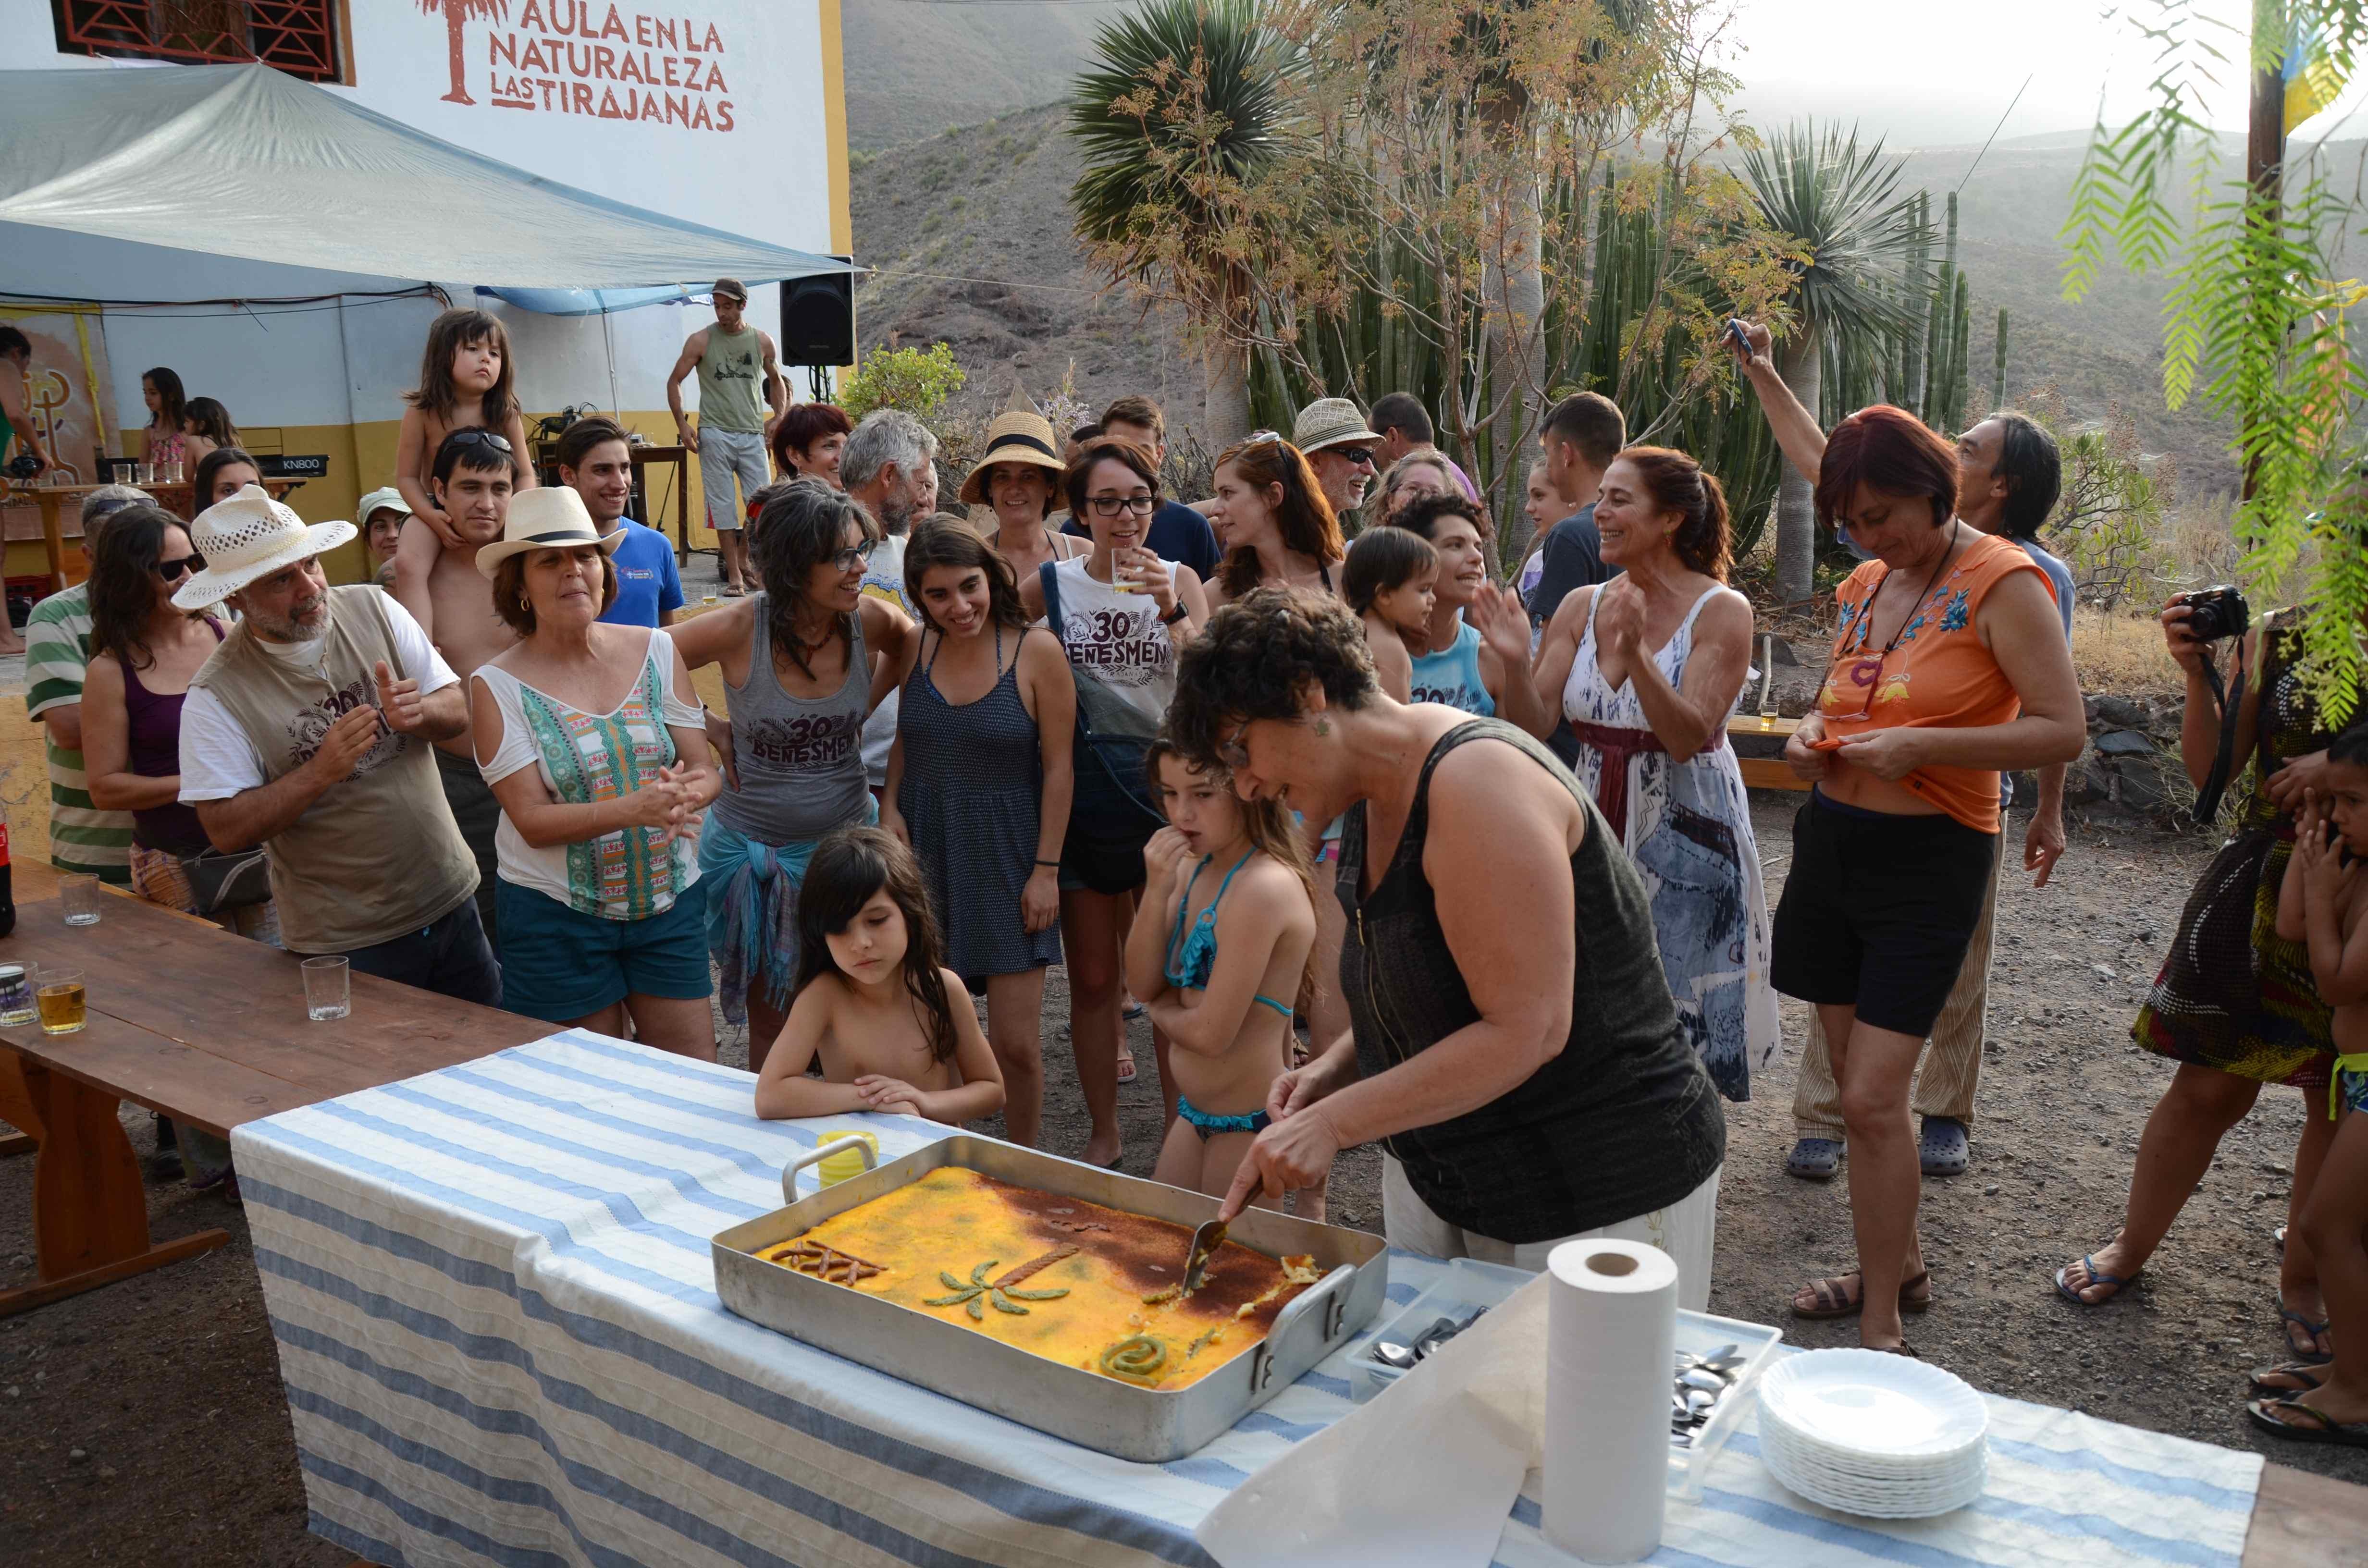 Aula en la Naturaleza de Las Tirajanas 30º aniversario